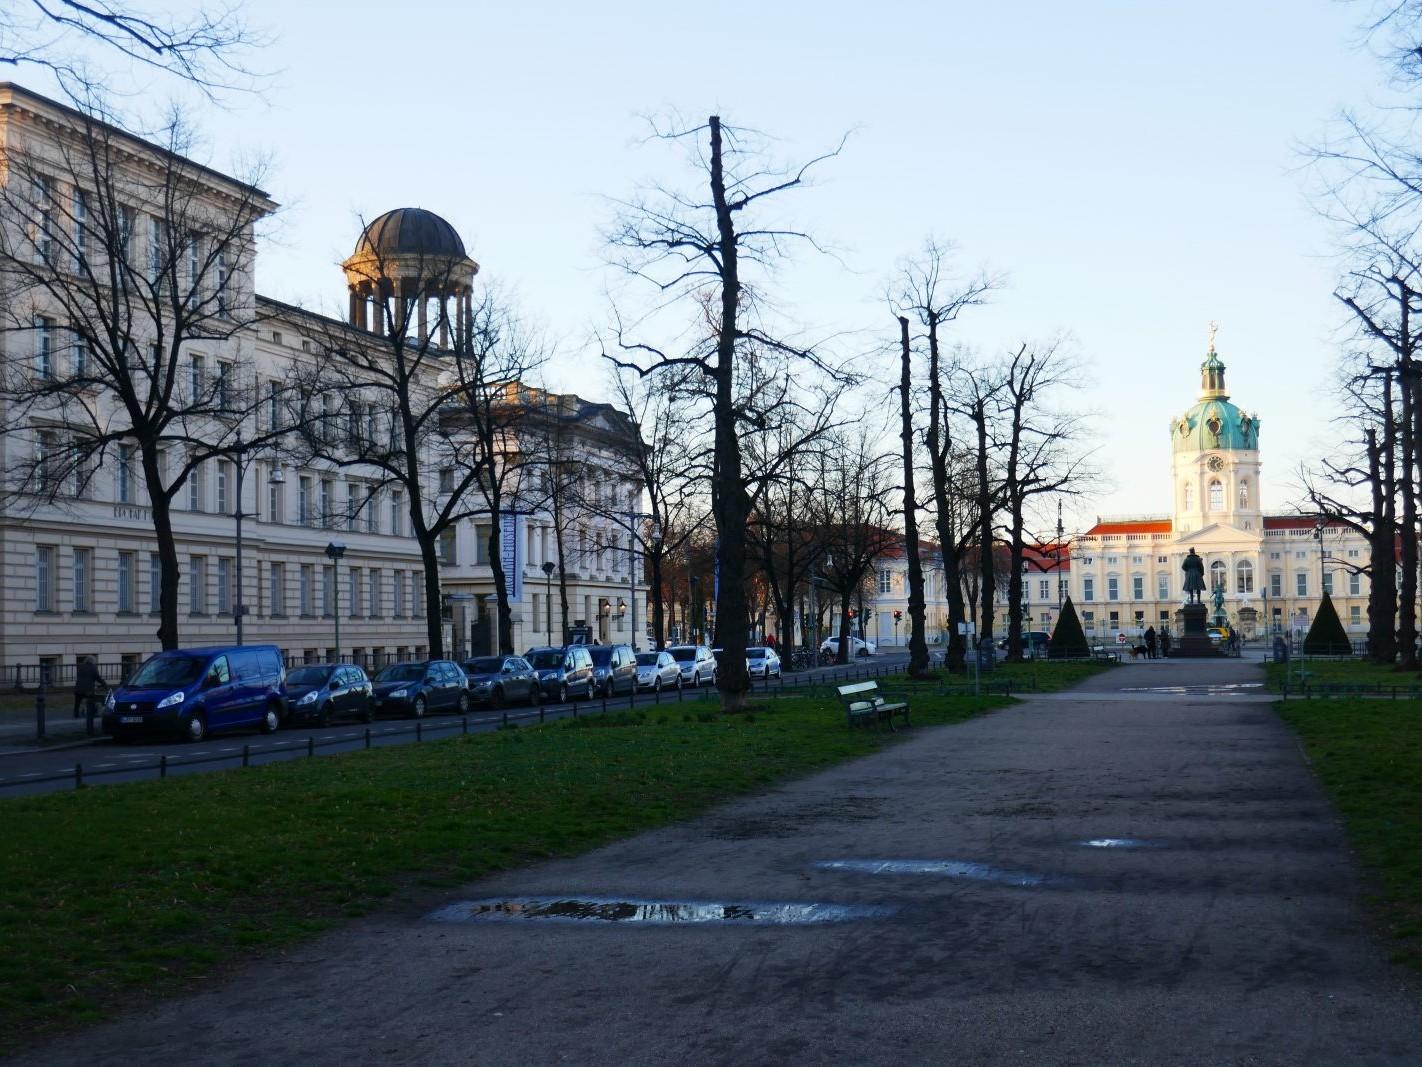 Neues Museumsquartier: Rund um das Charlottenburger Schloss - Foto: Stefan Rethfeld